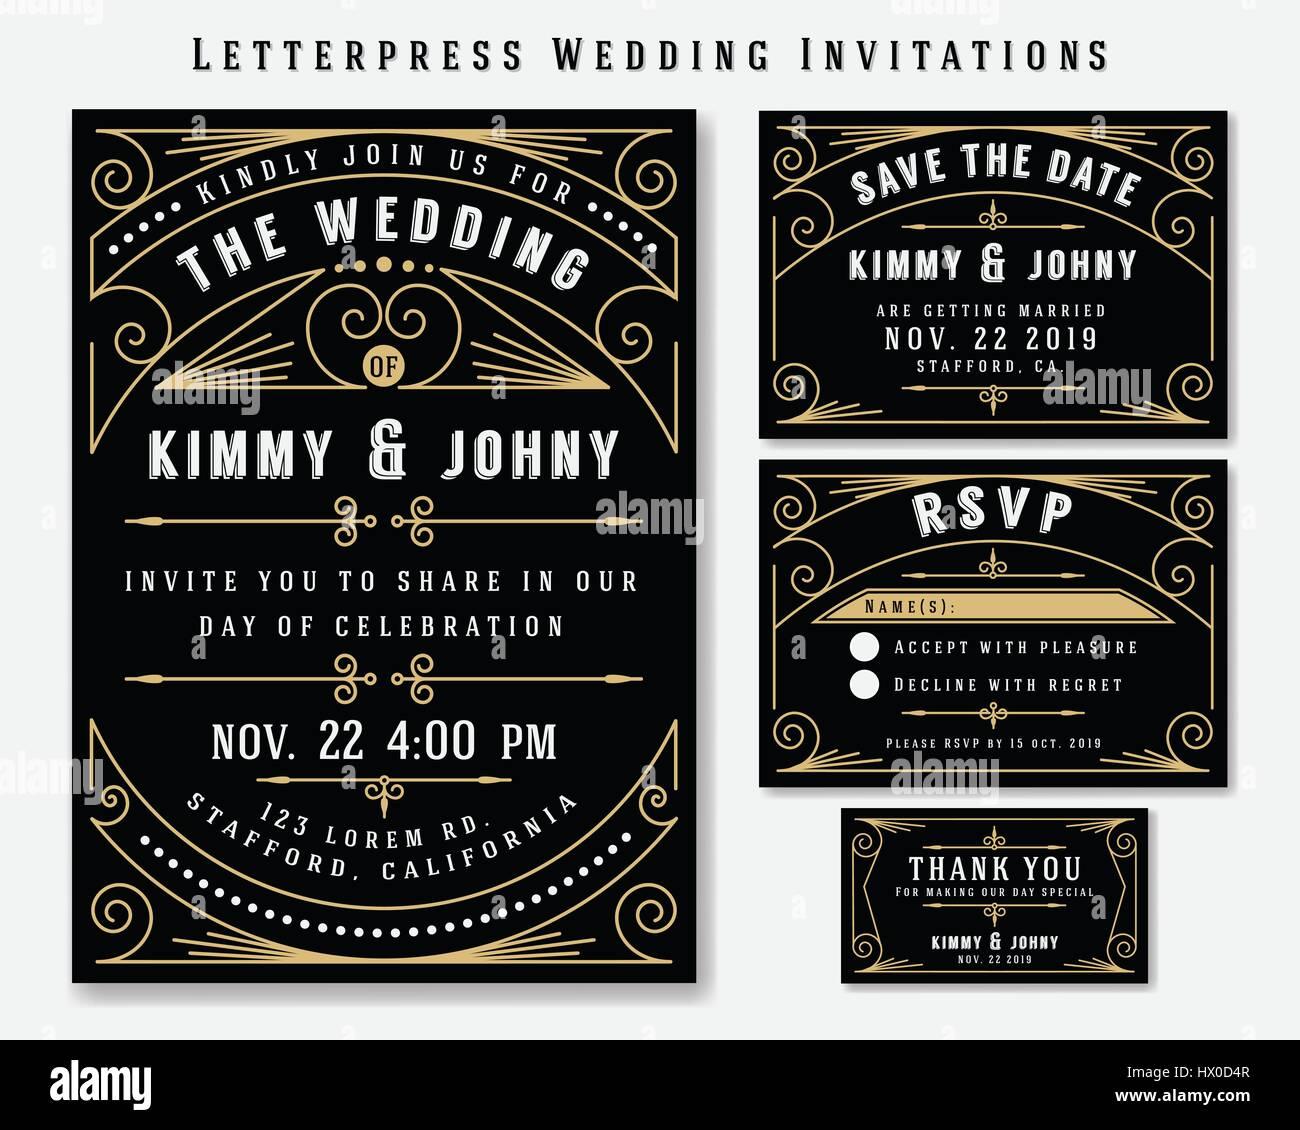 Art deco letterpress wedding invitation design template include art deco letterpress wedding invitation design template include rsvp card save the date card thank you tags classic vintage style frame stopboris Images